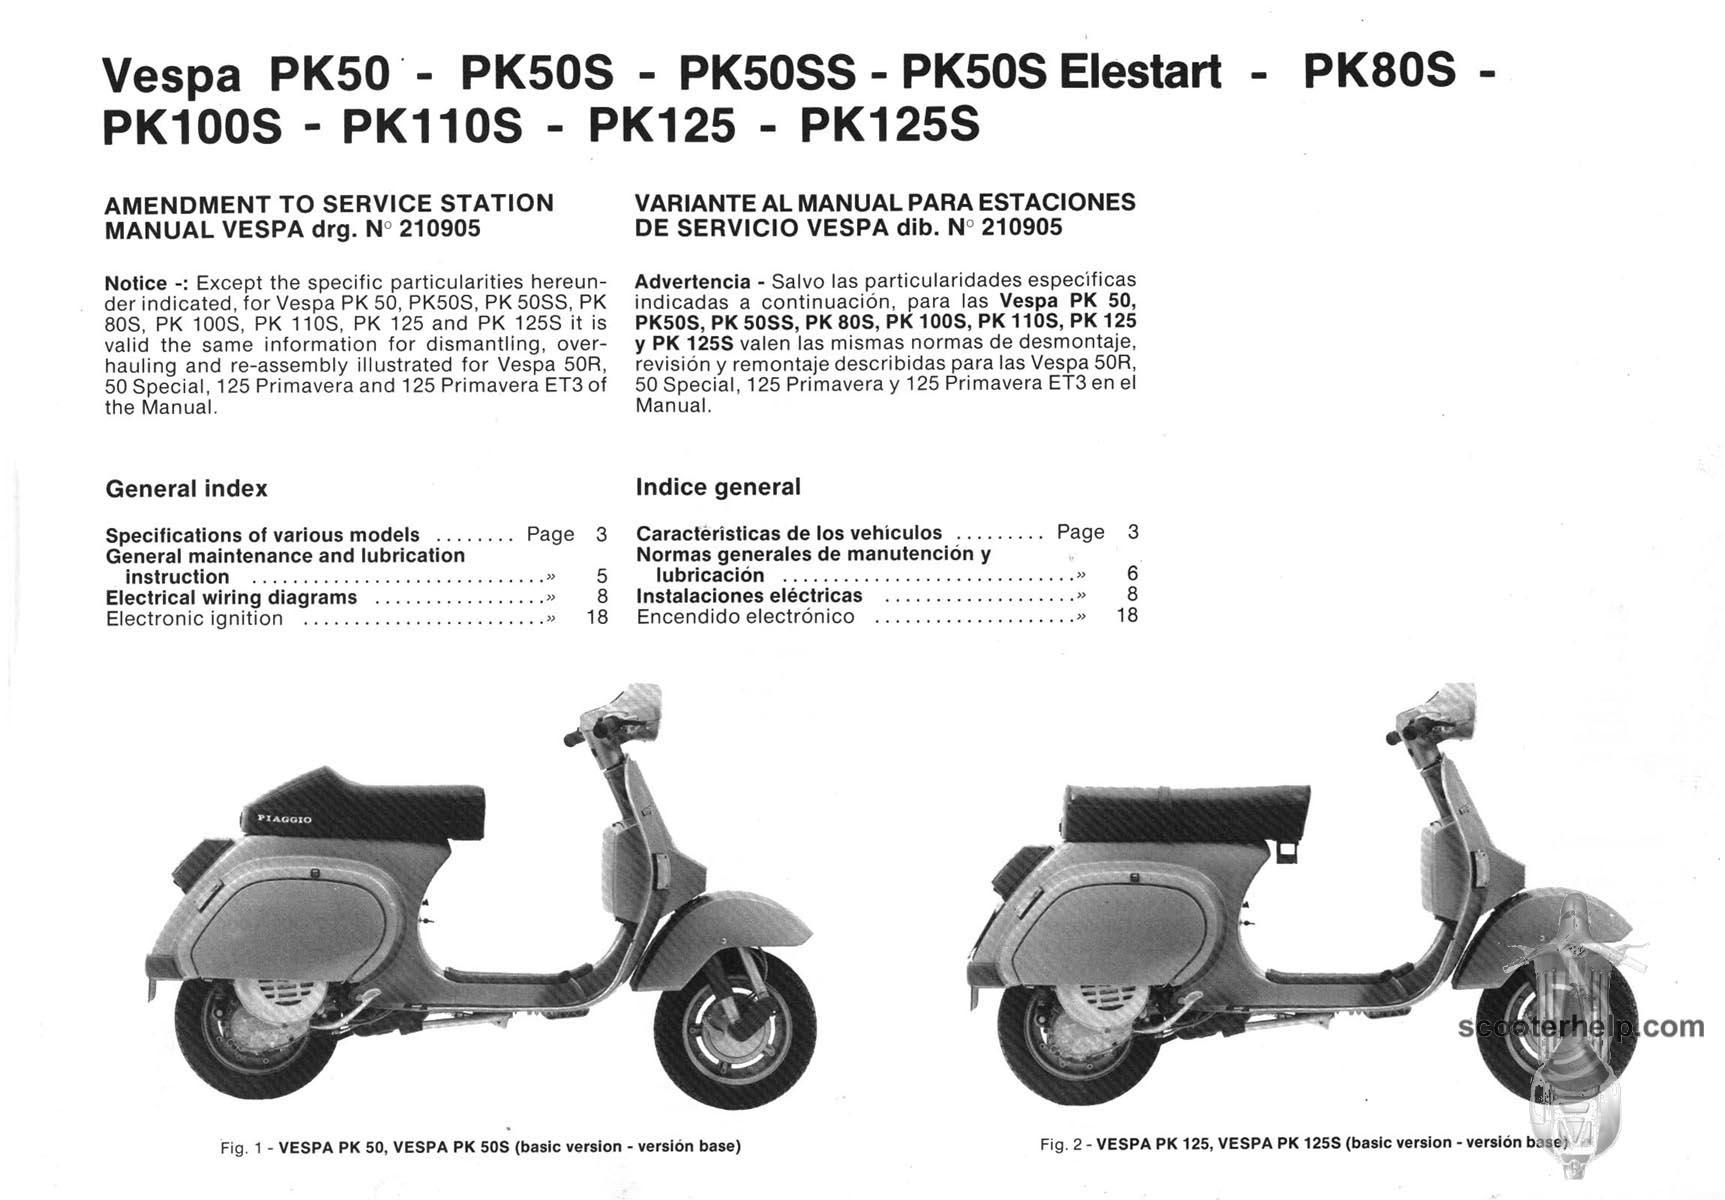 Vespa Manual Pdf Complete Wiring Diagrams Gts 300 Super Diagram Pk Factory Repair Rh Scooterhelp Com Et4 125 Gtv 250